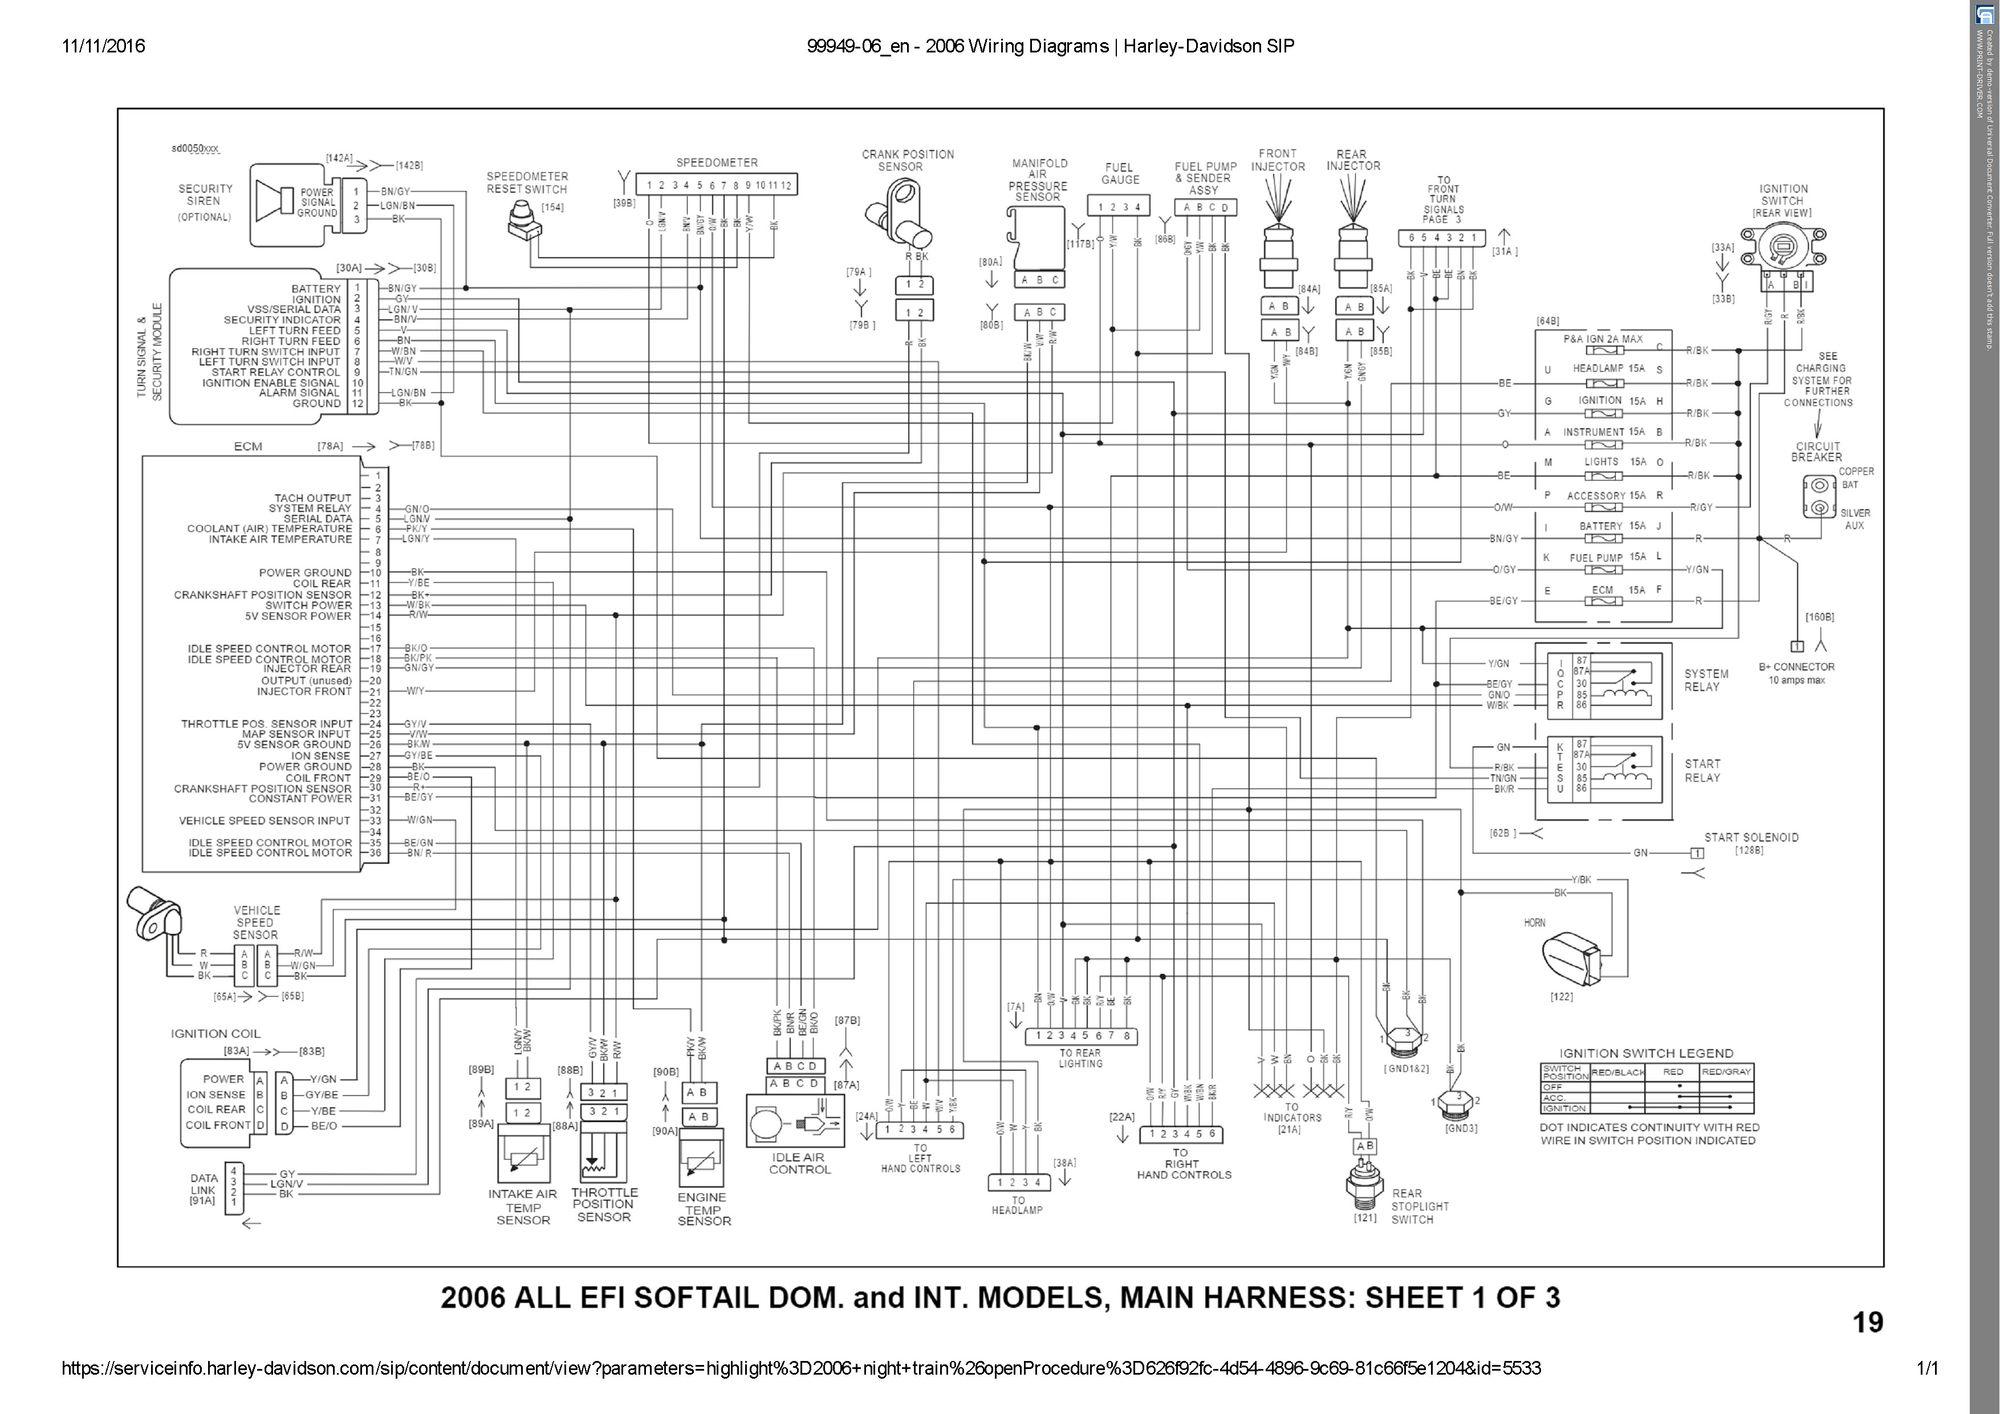 GE_0965] Wiring Diagram For 1997 Softail Wiring Diagram